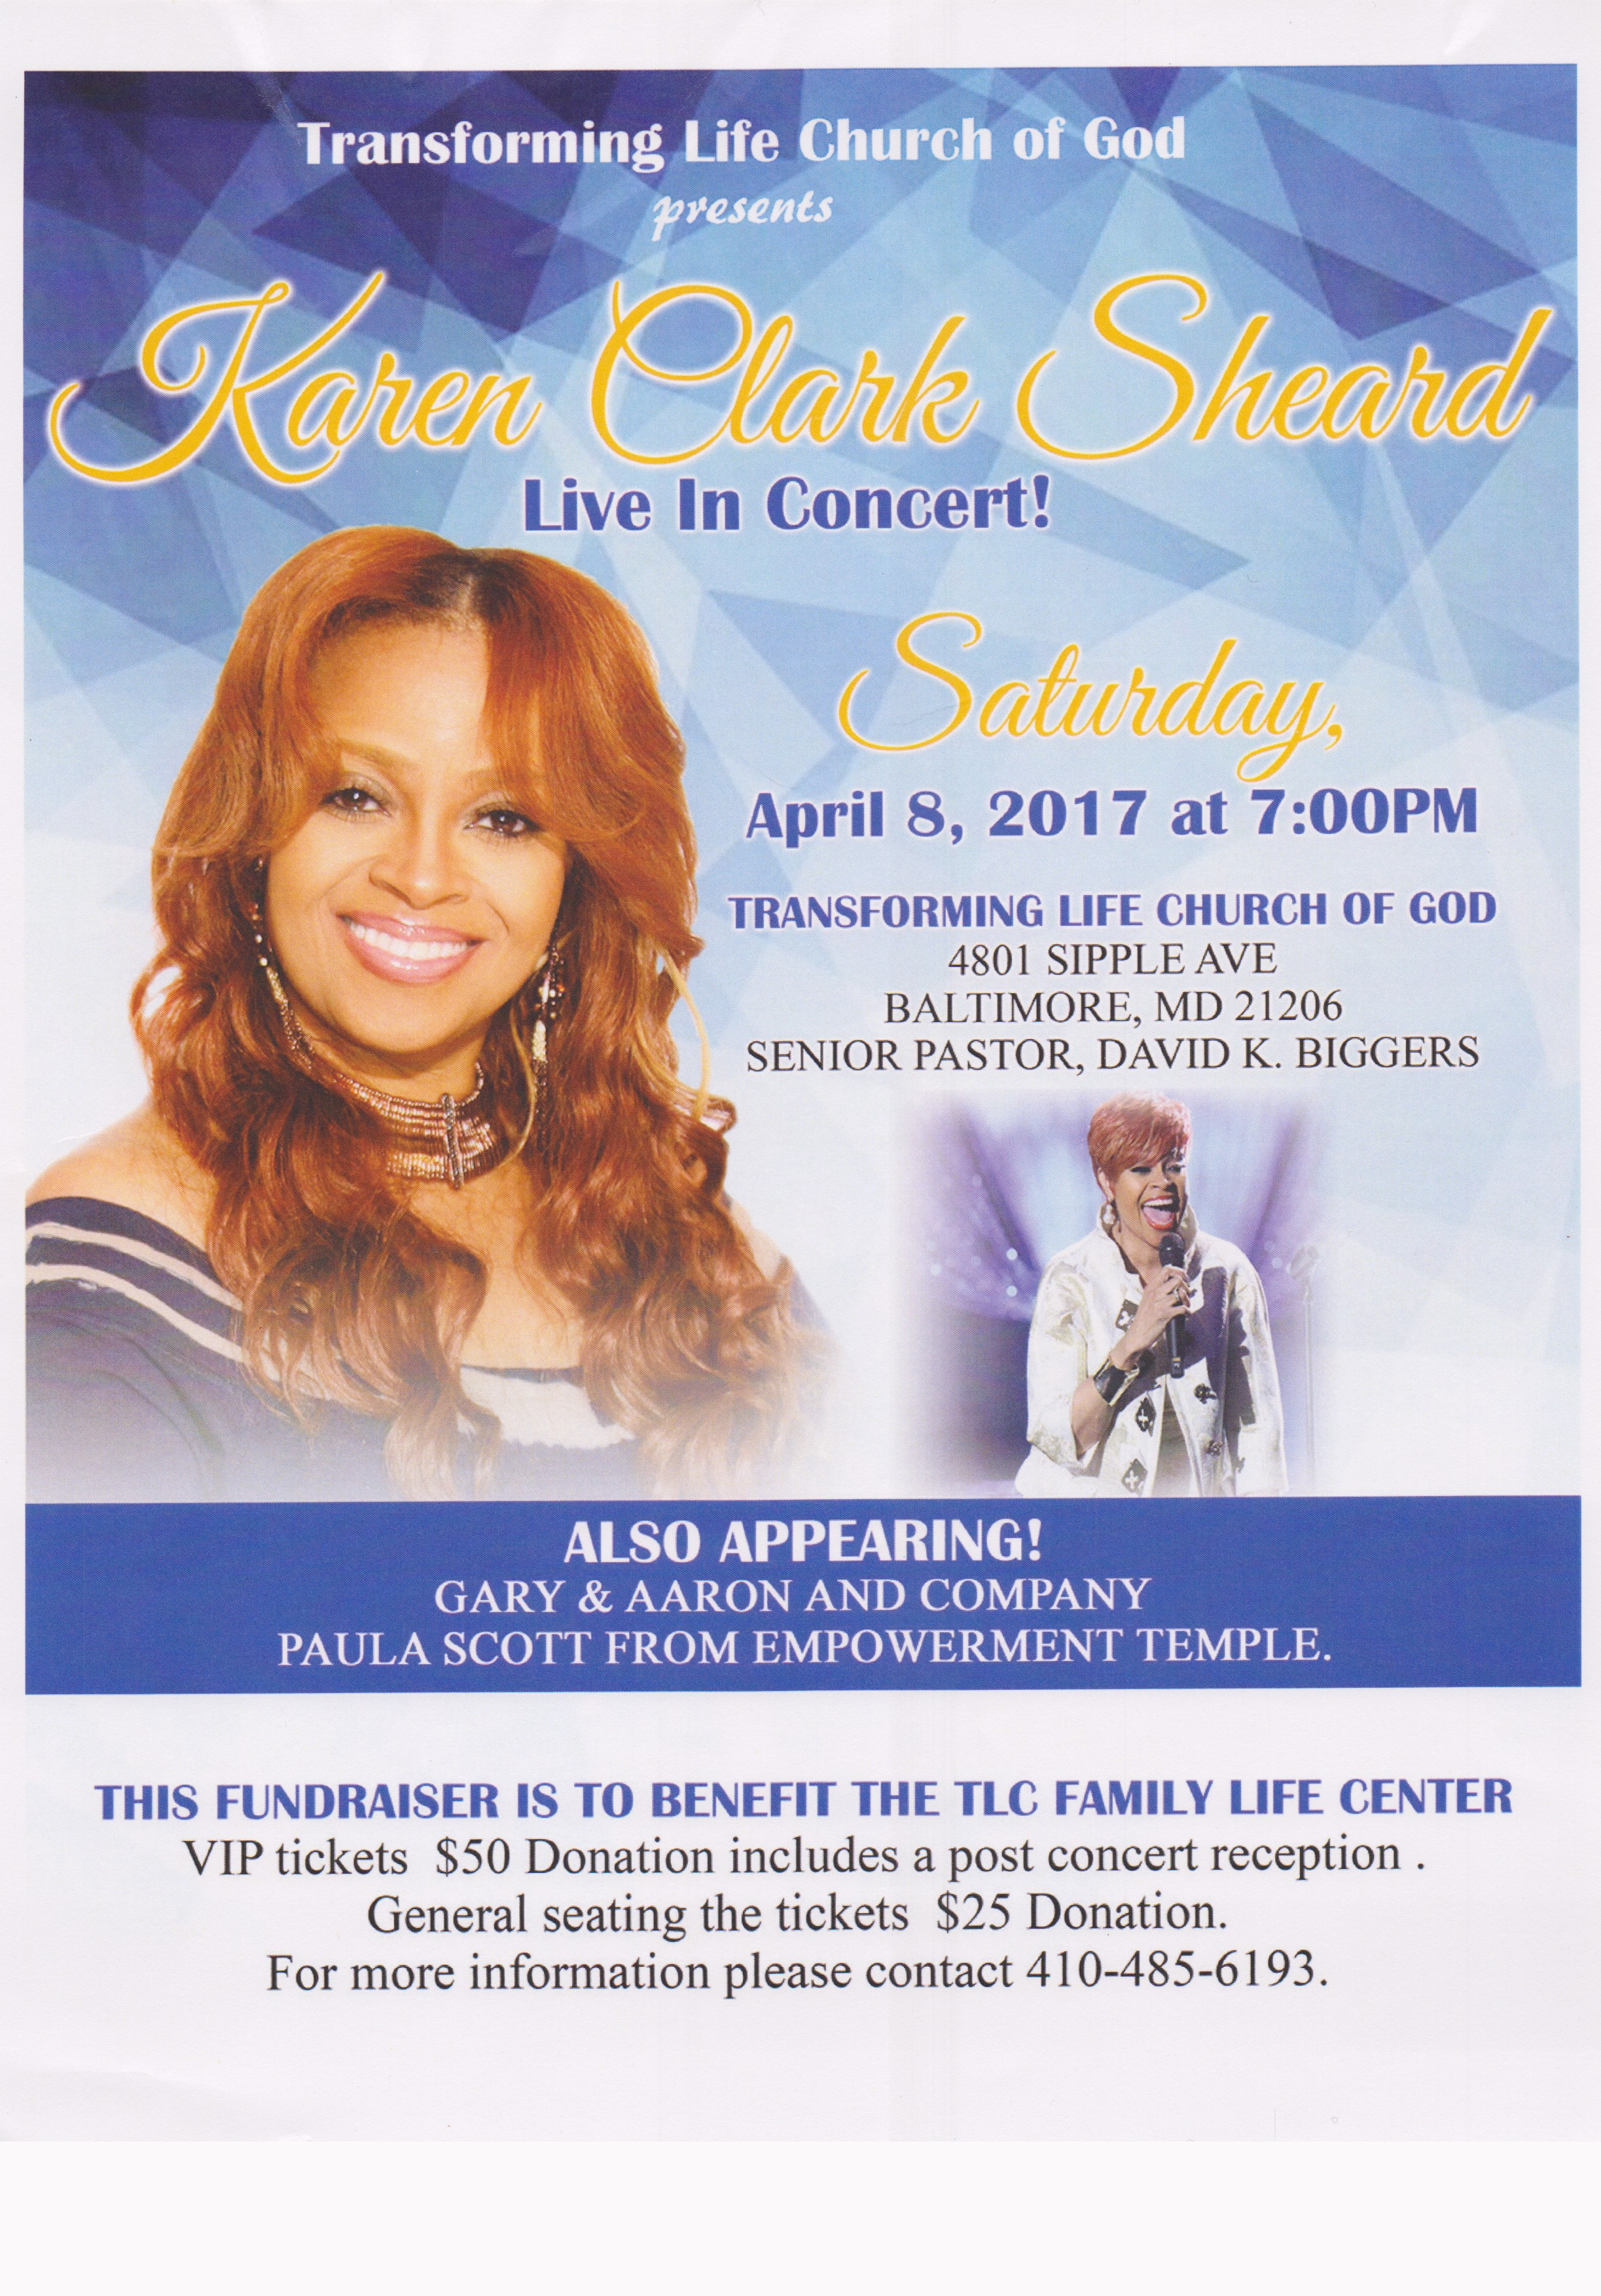 Karen Clark Sheard Concert